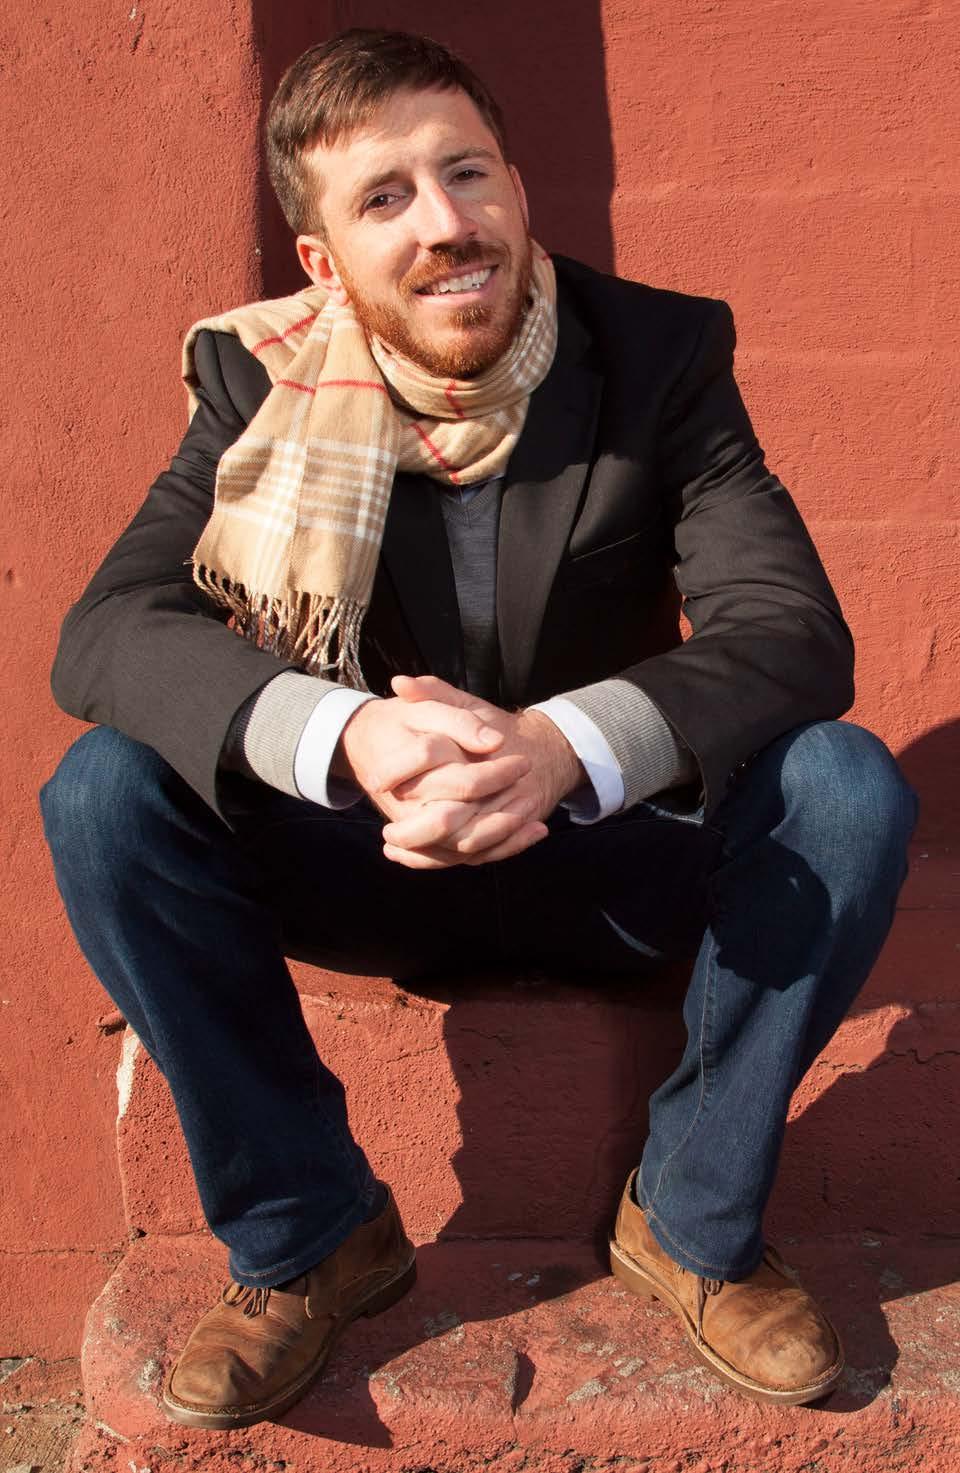 Joe Zimmerman Pic - USE Cropped.jpg